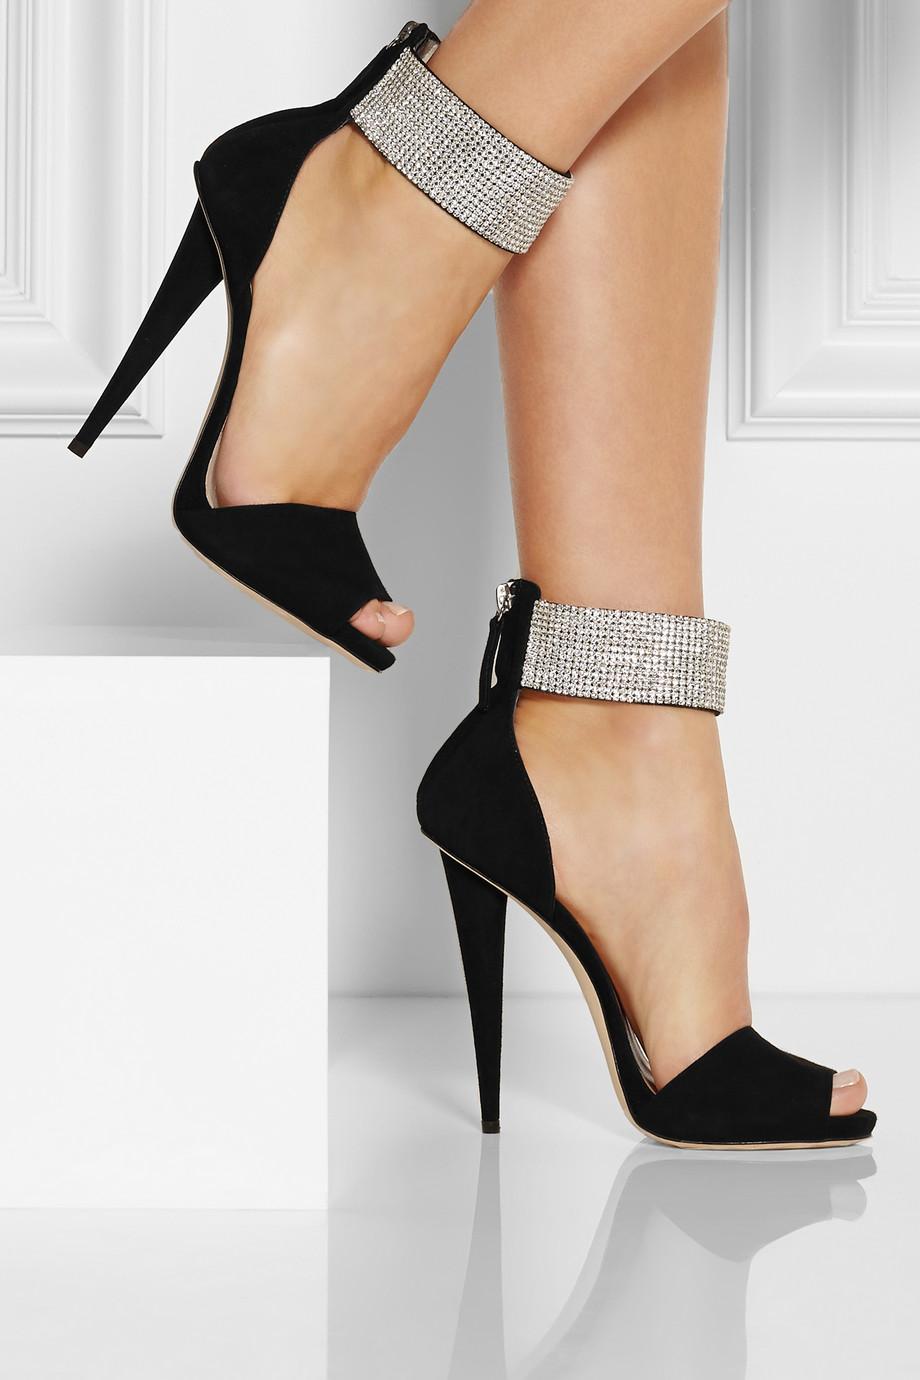 Find great deals on eBay for black heel sandals. Shop with confidence.